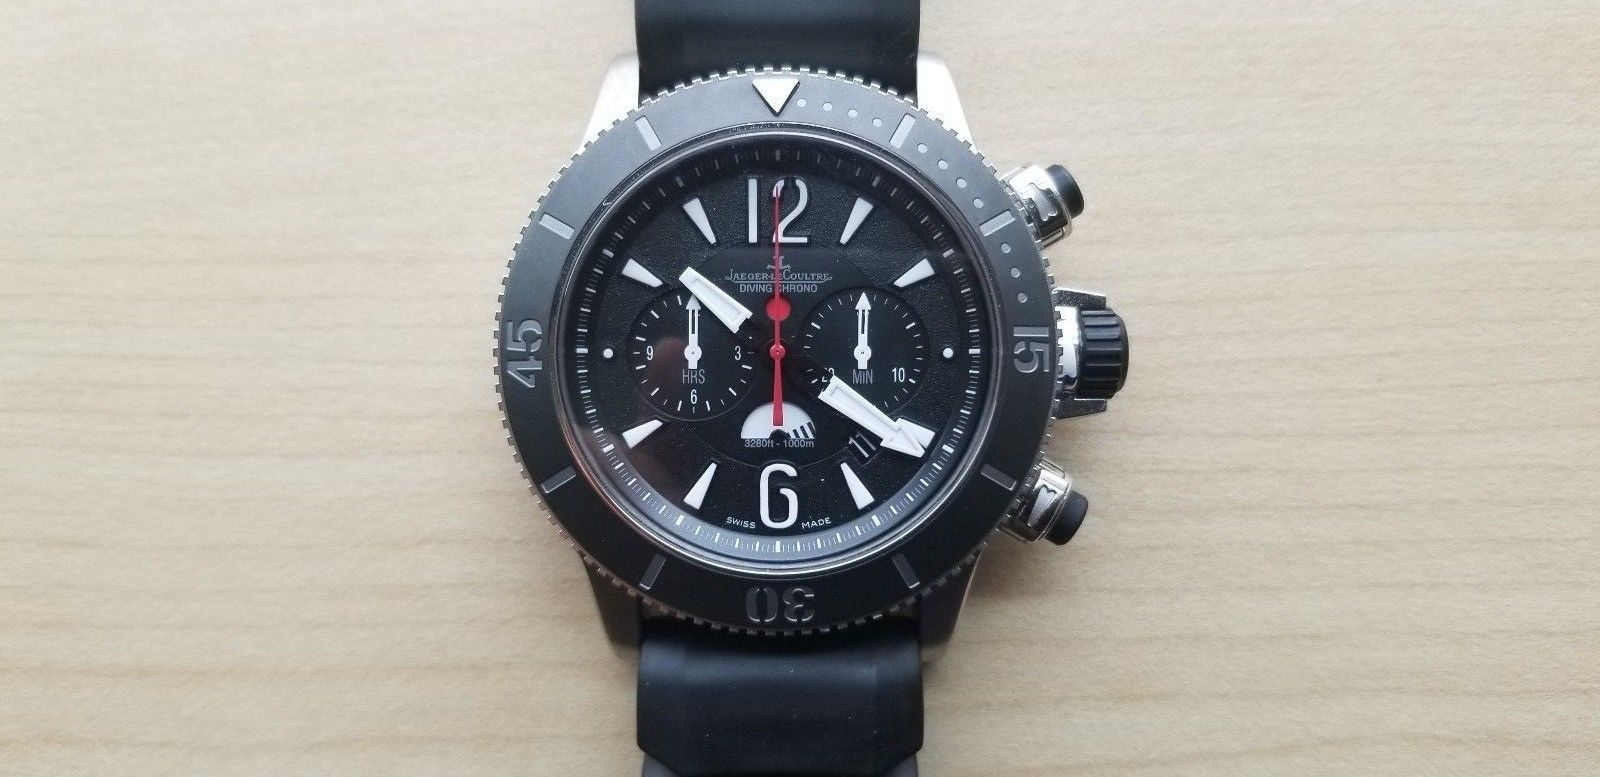 Jaeger LeCoultre Master Compressor Diving Chronograph GMT